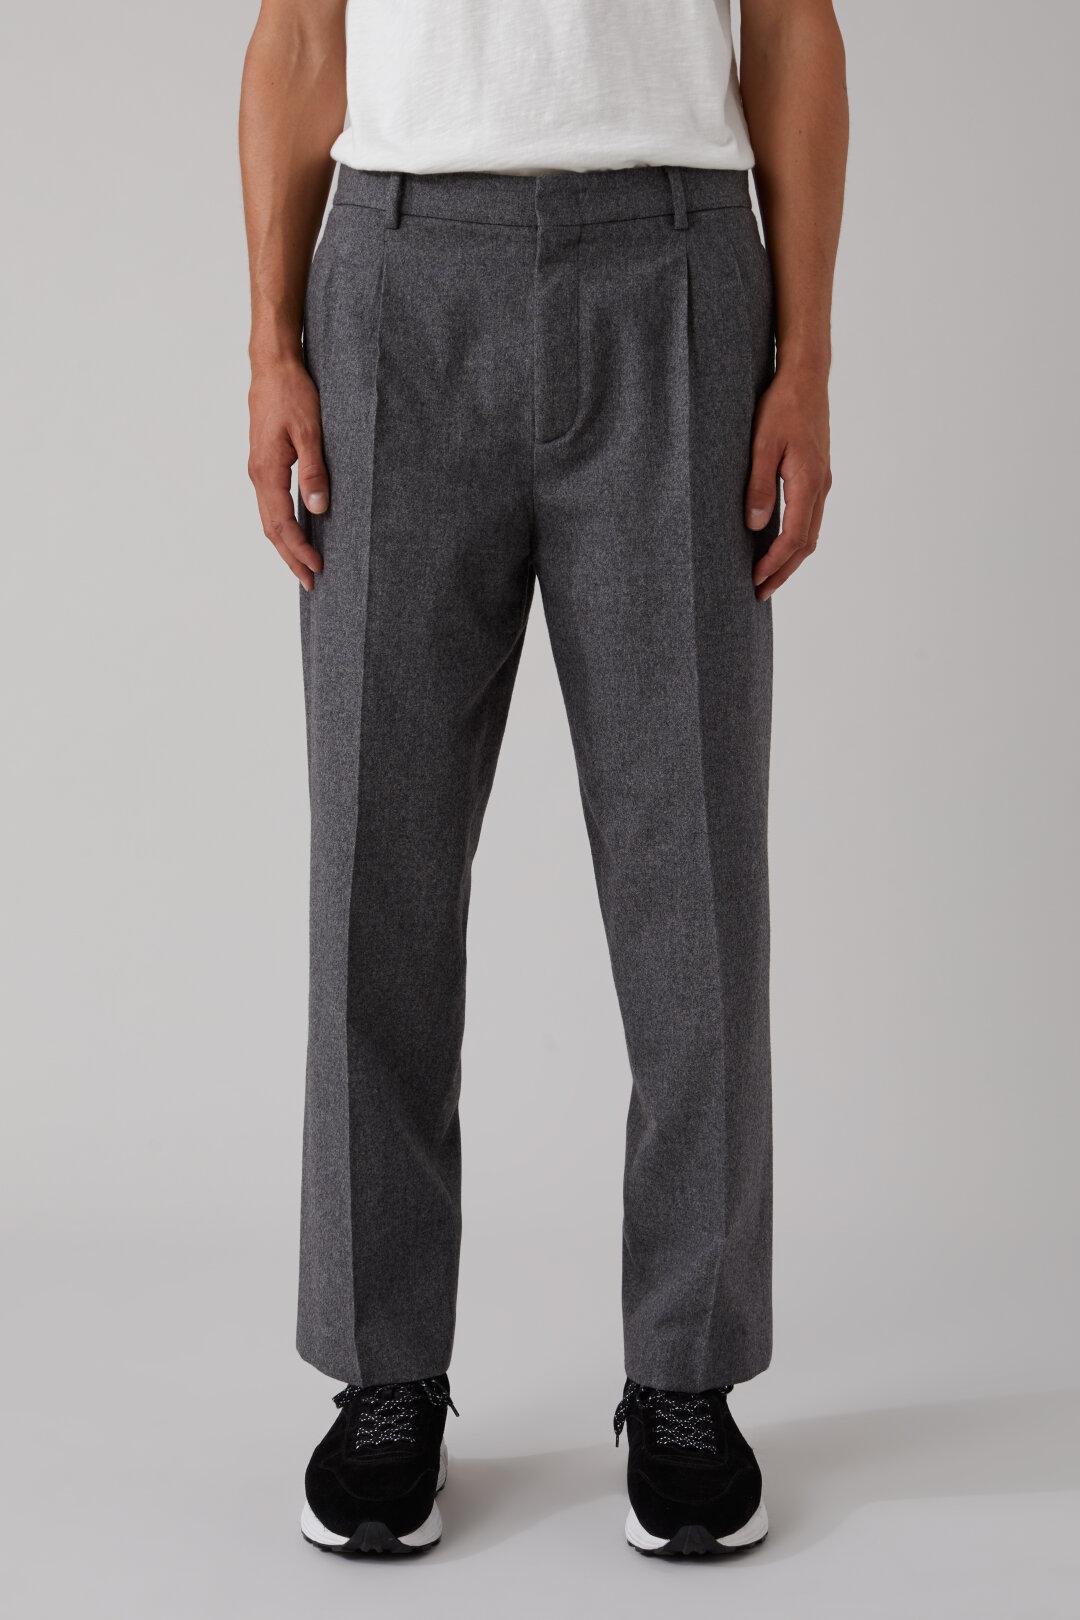 Bergdorf Goodman Pants